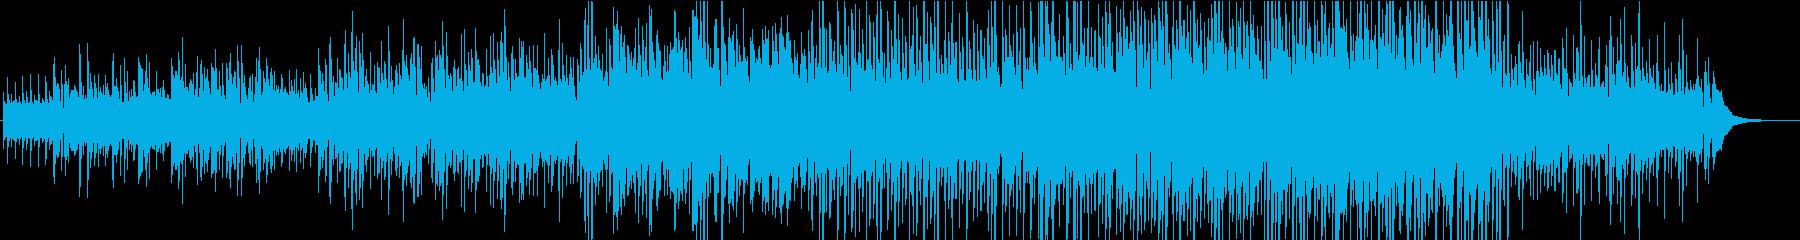 uguisuの再生済みの波形